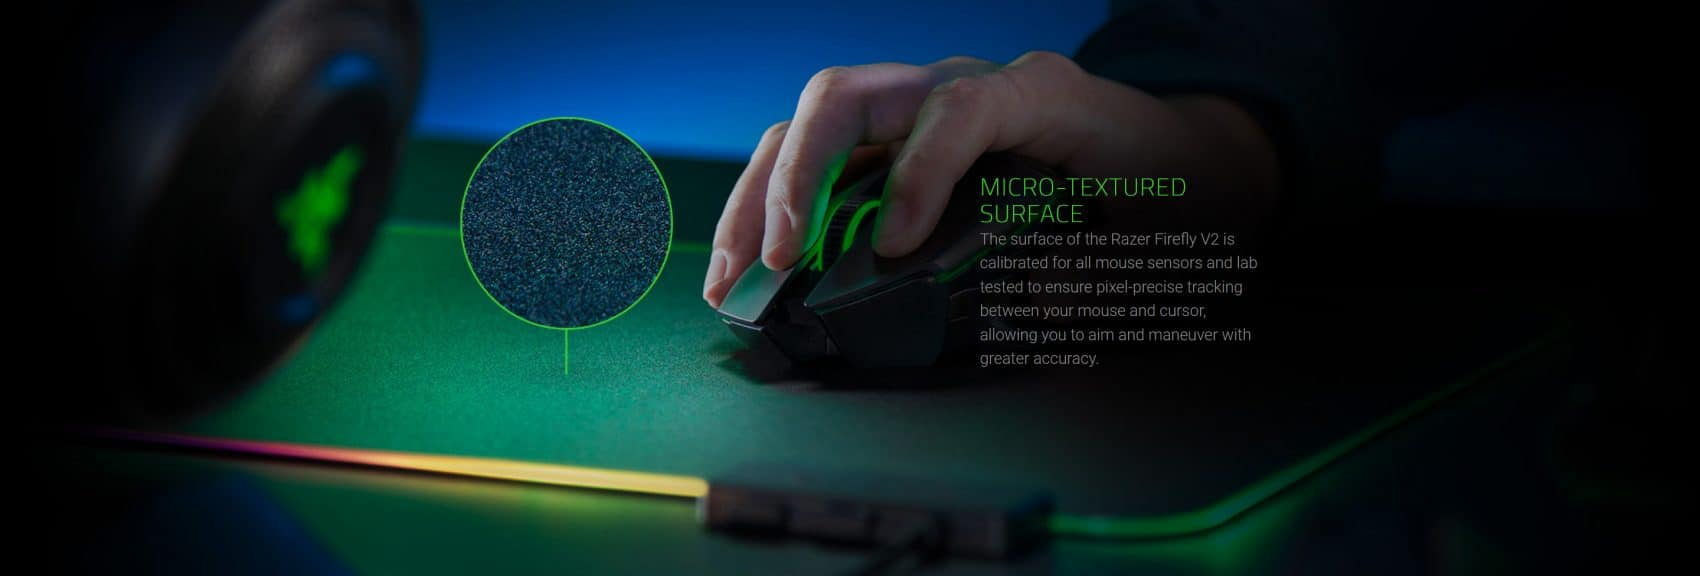 Razer Firefly v2 rgb texture de la surface